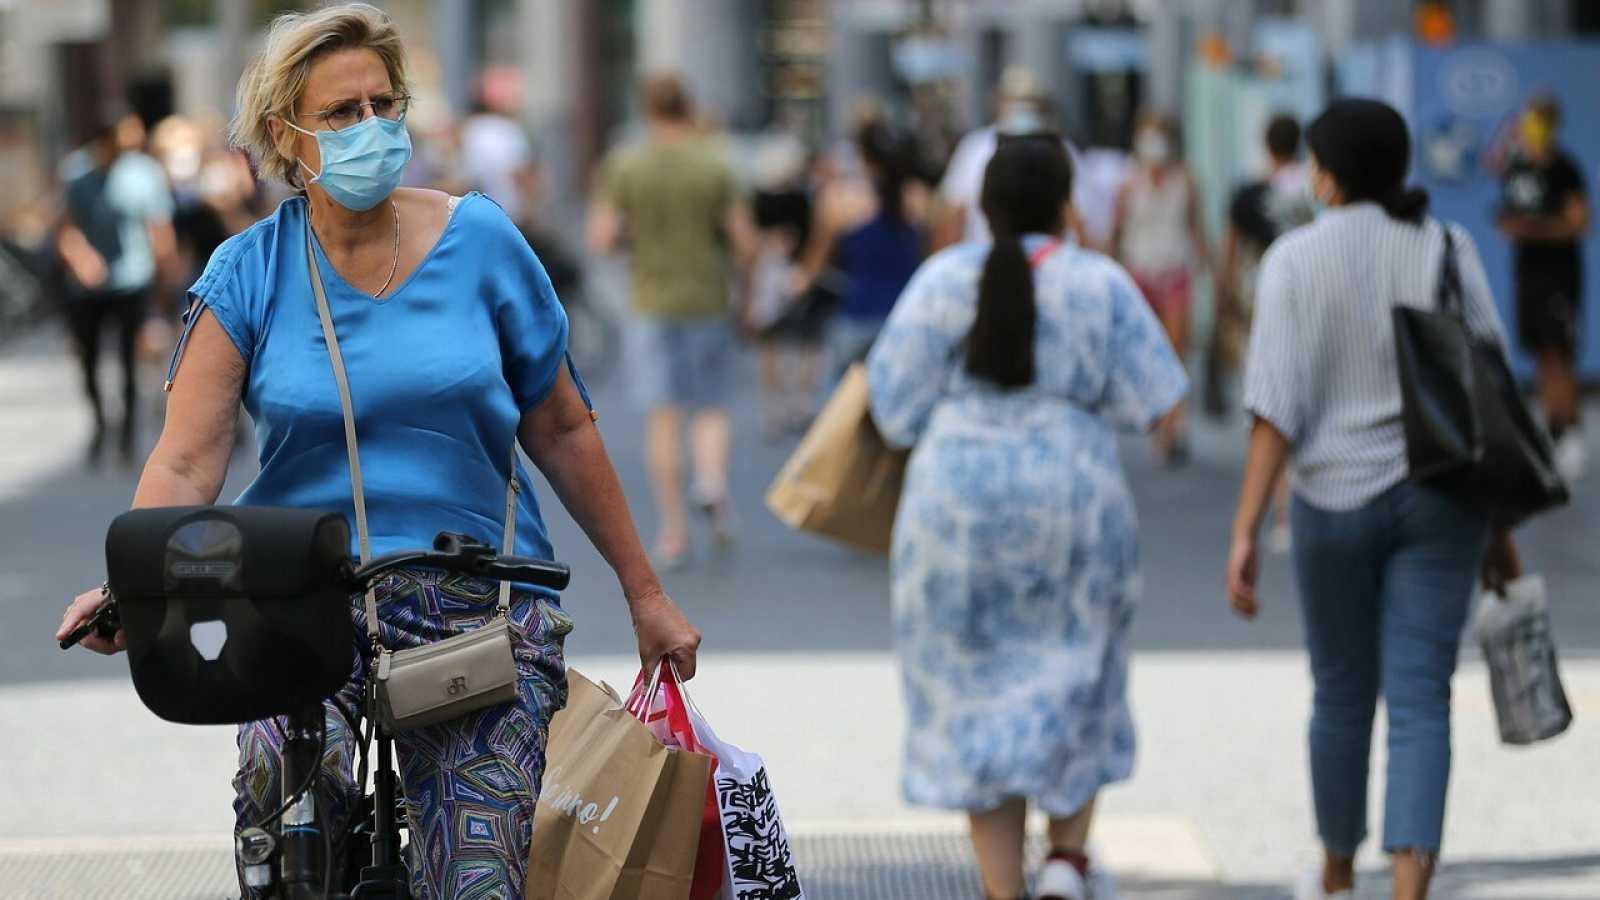 Una mujer con mascarilla en Amberes, Bélgica. François WALSCHAERTS / AFP